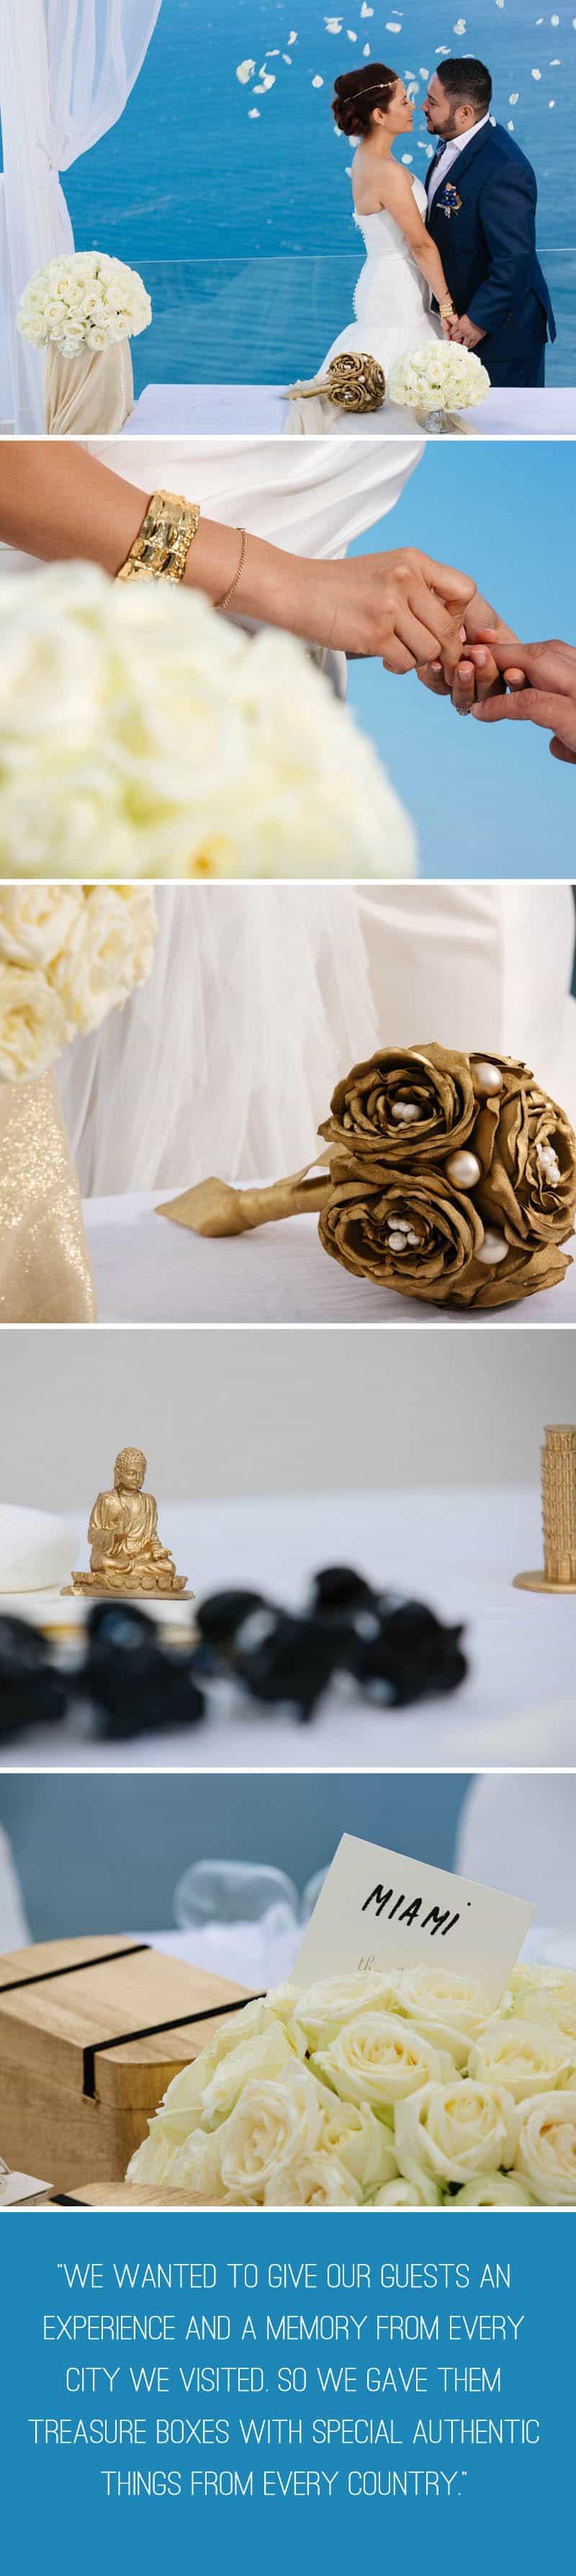 A Travel Themed Destination Wedding in Santorini 4